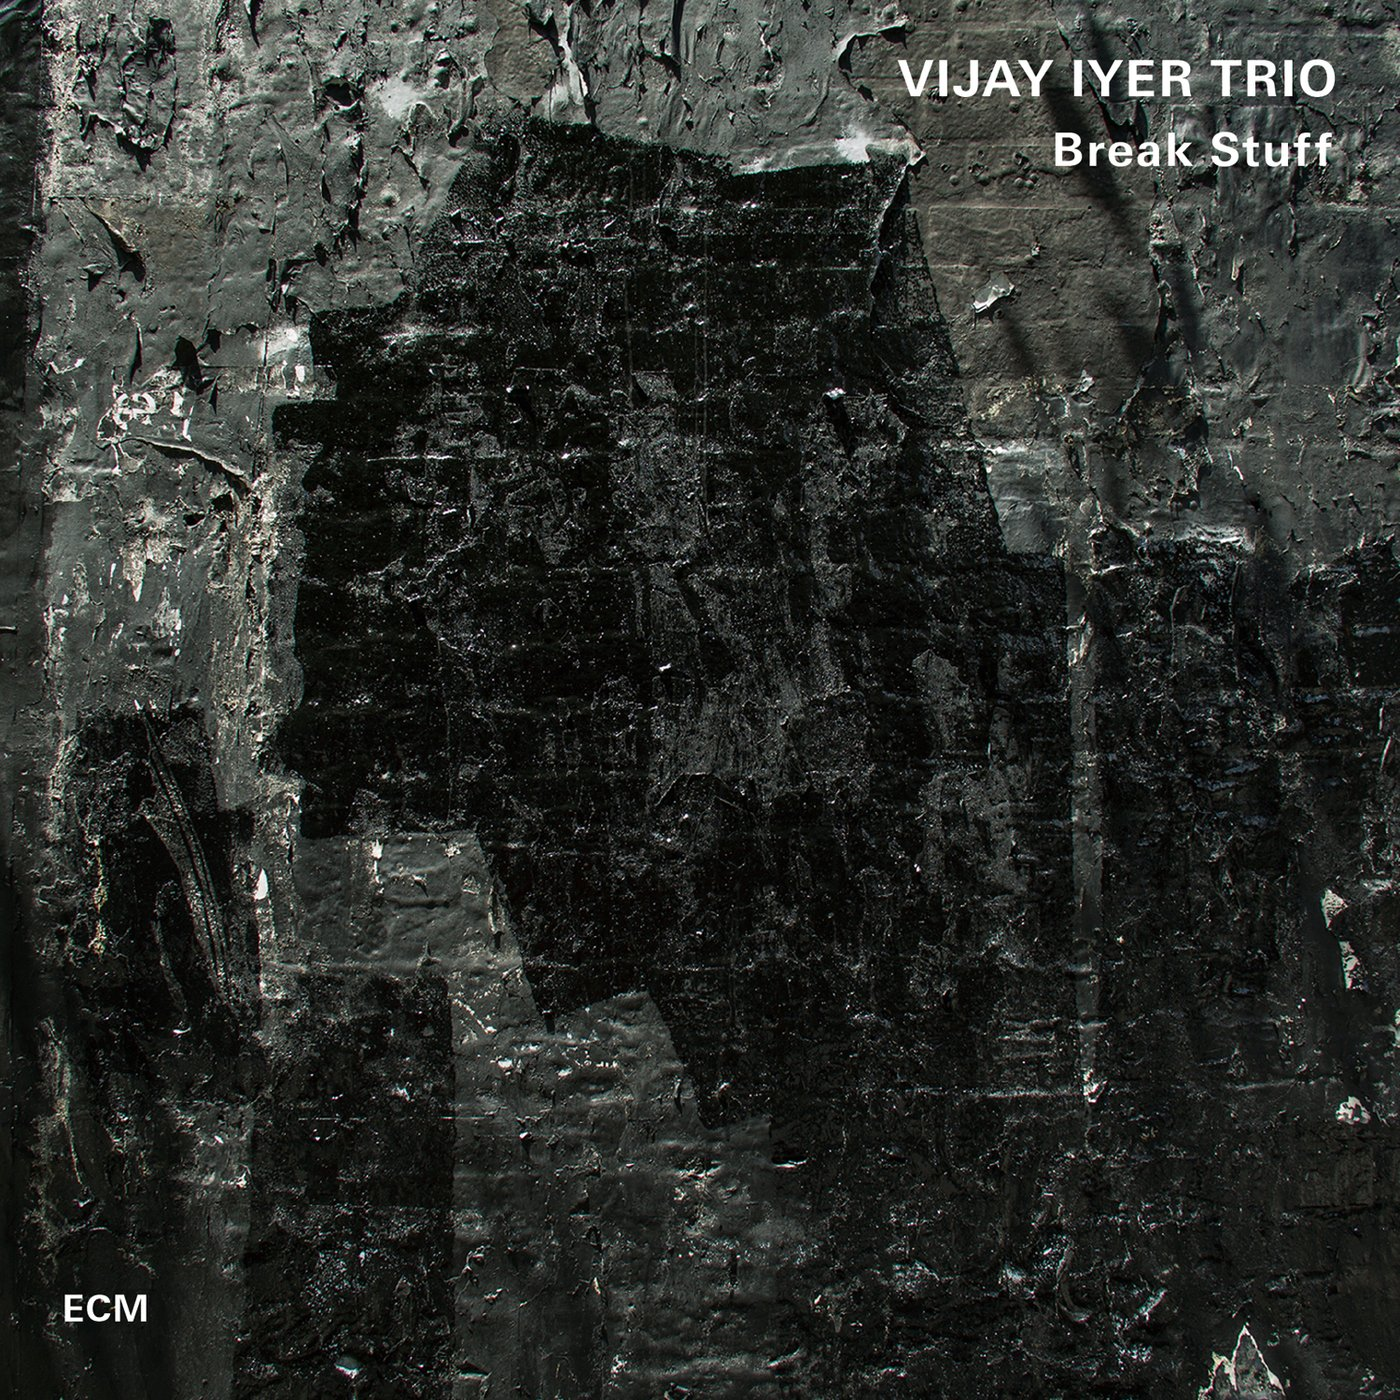 Vijay Iyer Trio - Break Stuff - Amazon.com Music